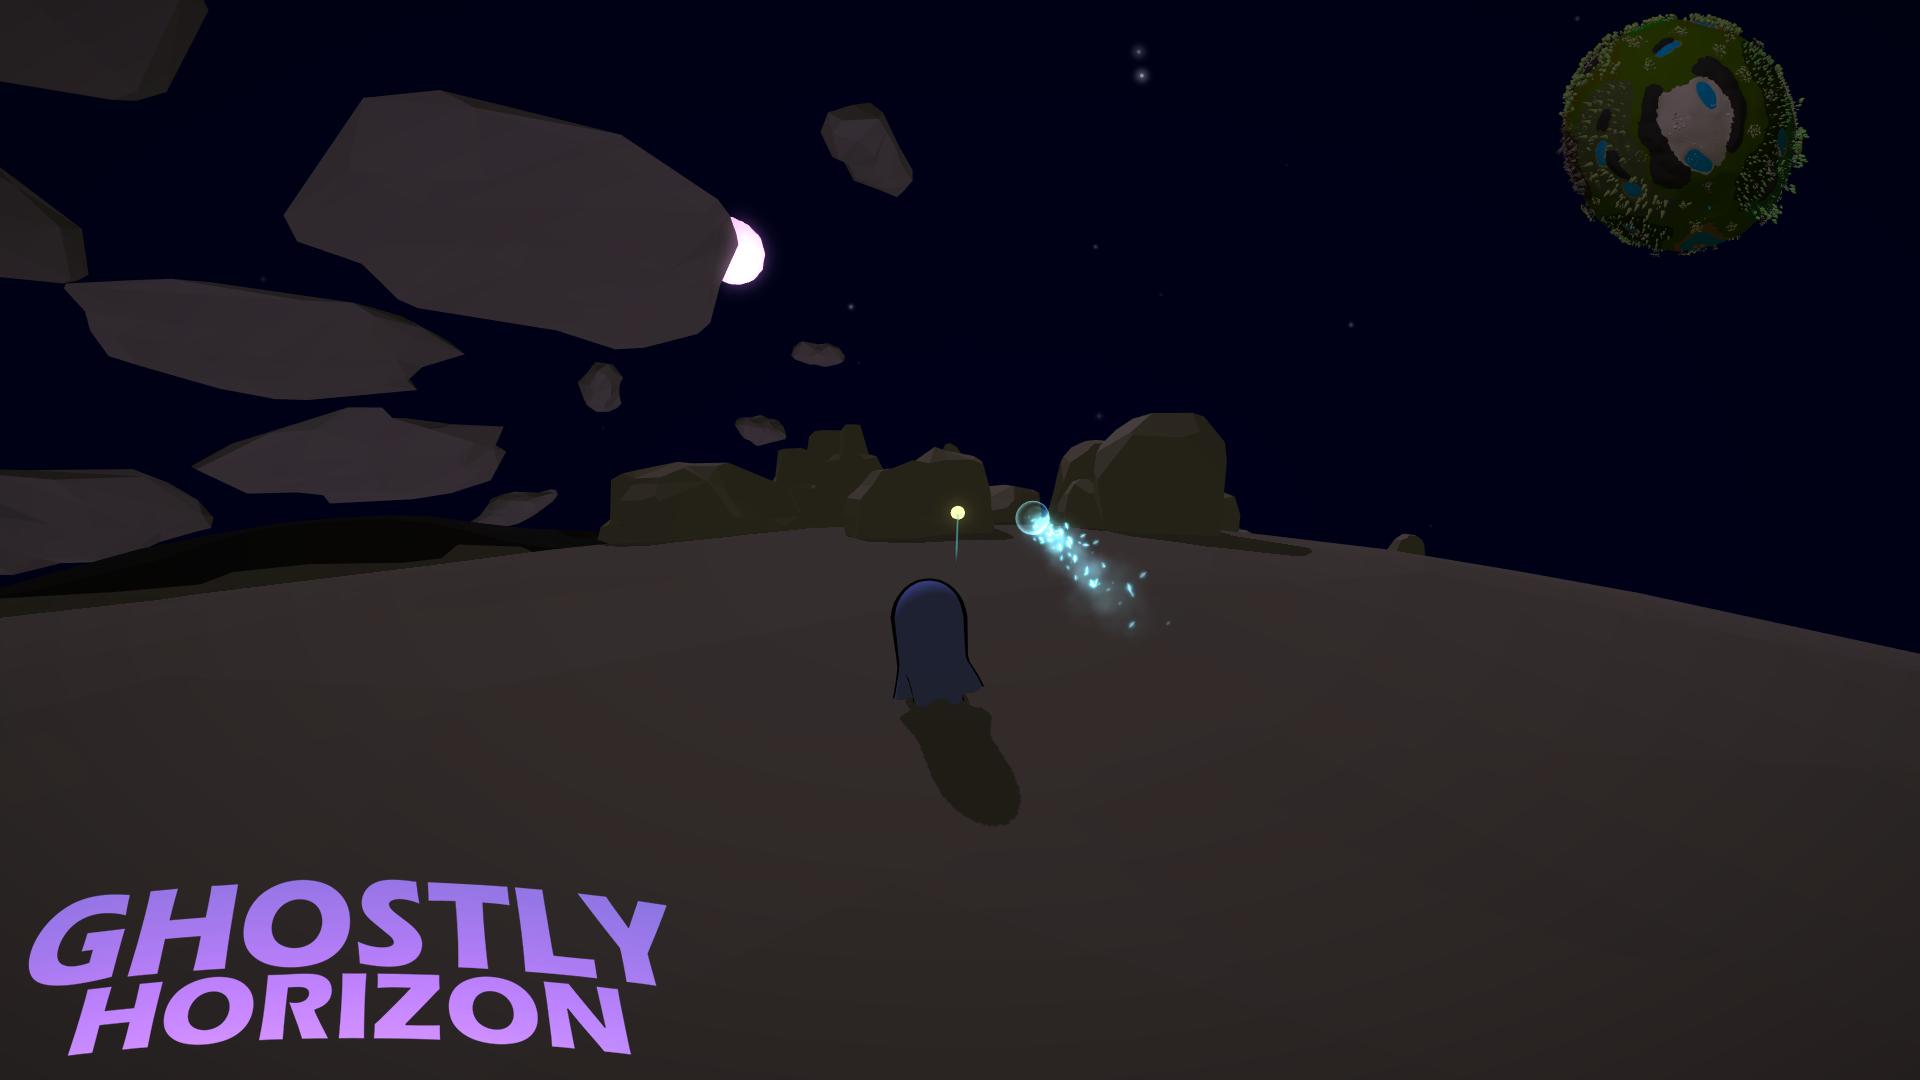 Ghostly Horizon - Ice Sphere spell